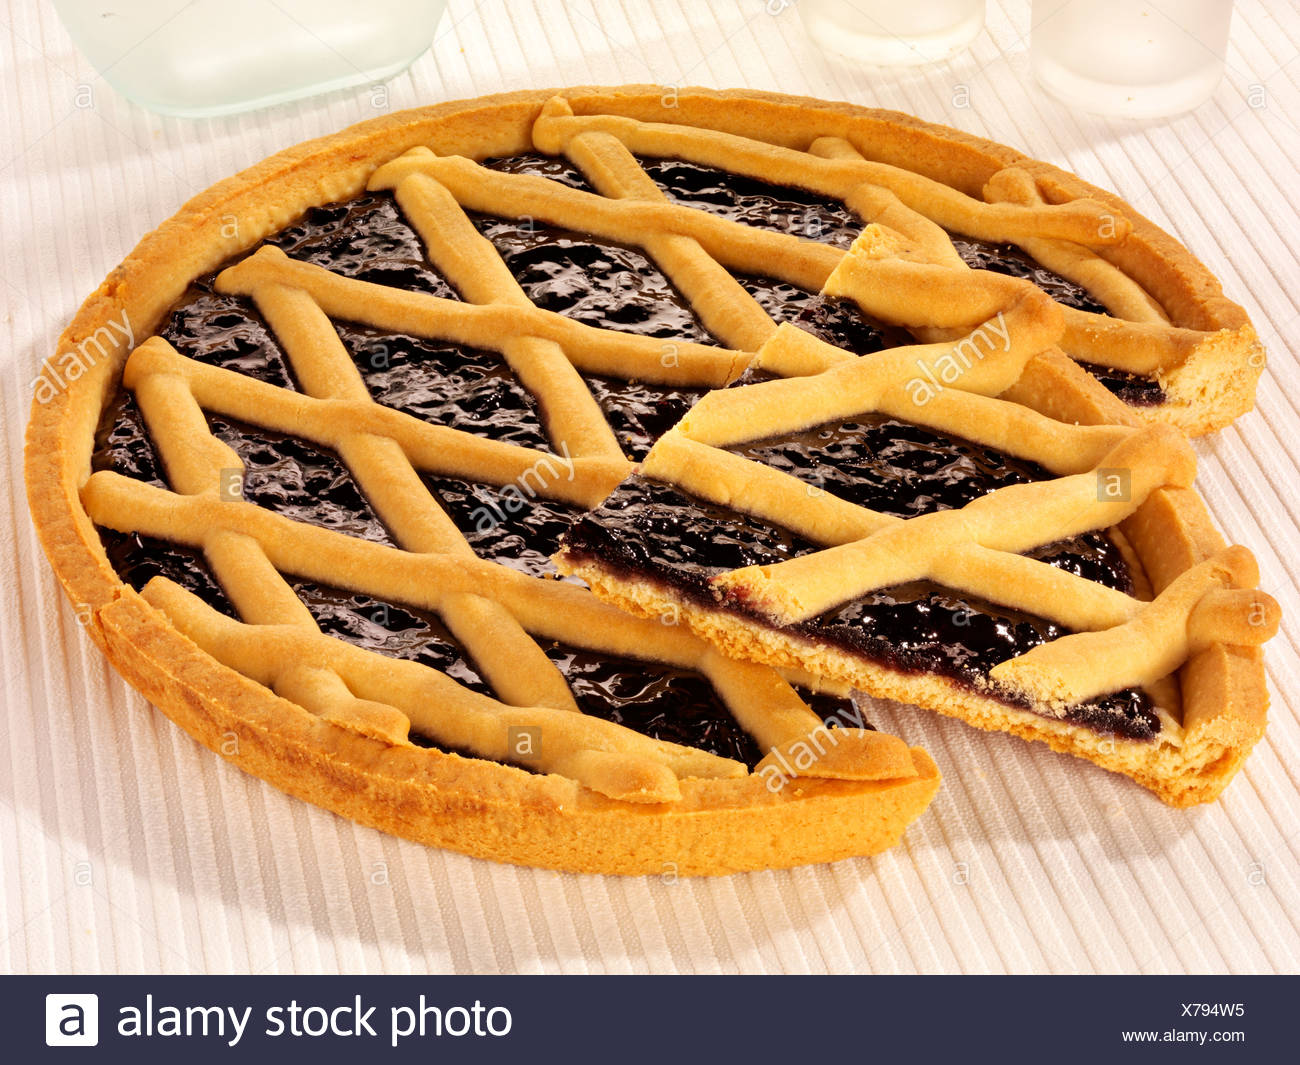 how to cut lattice pastry